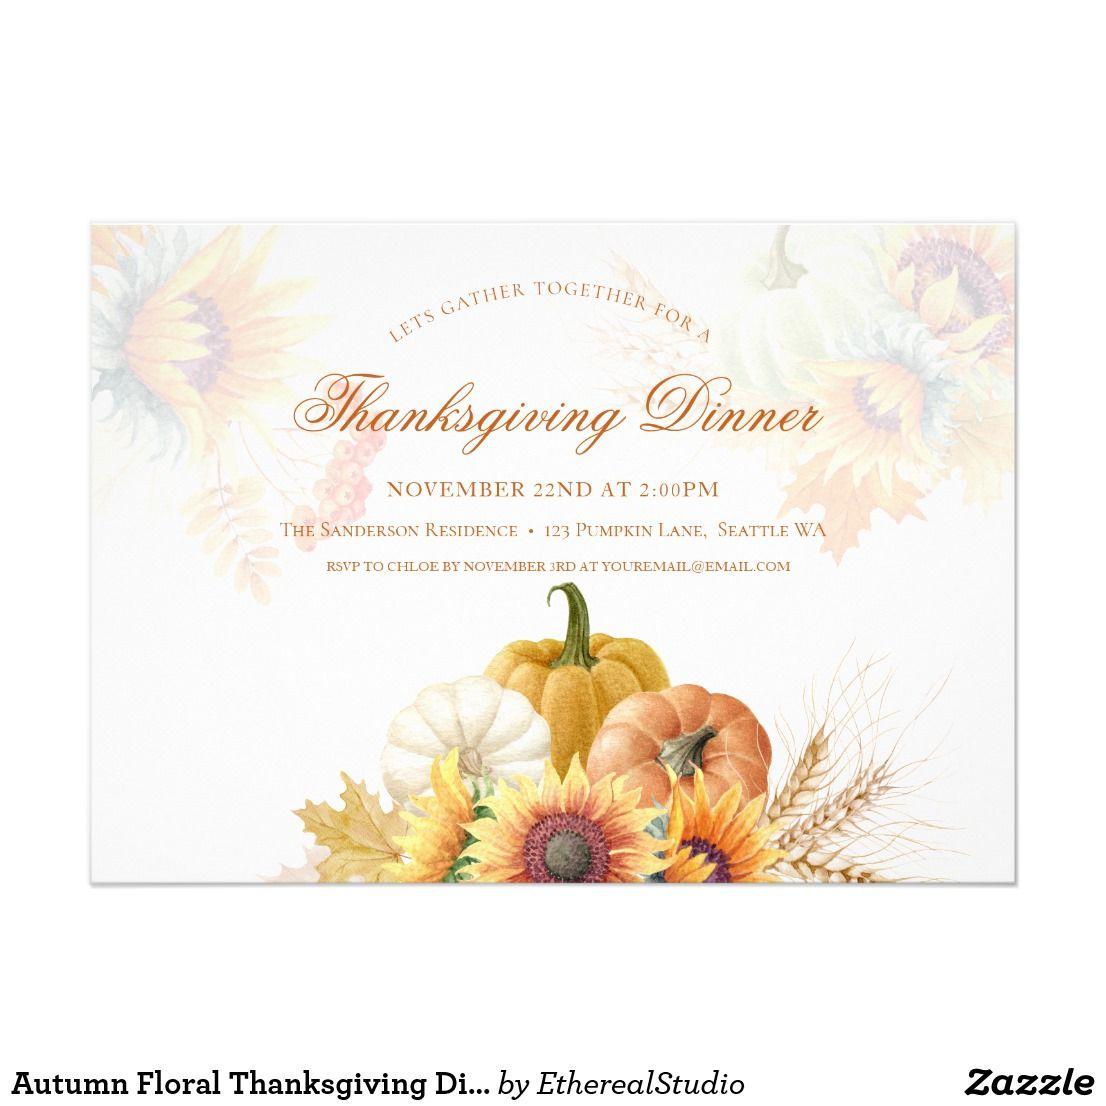 Autumn Floral Thanksgiving Dinner Invitation Card Zazzle